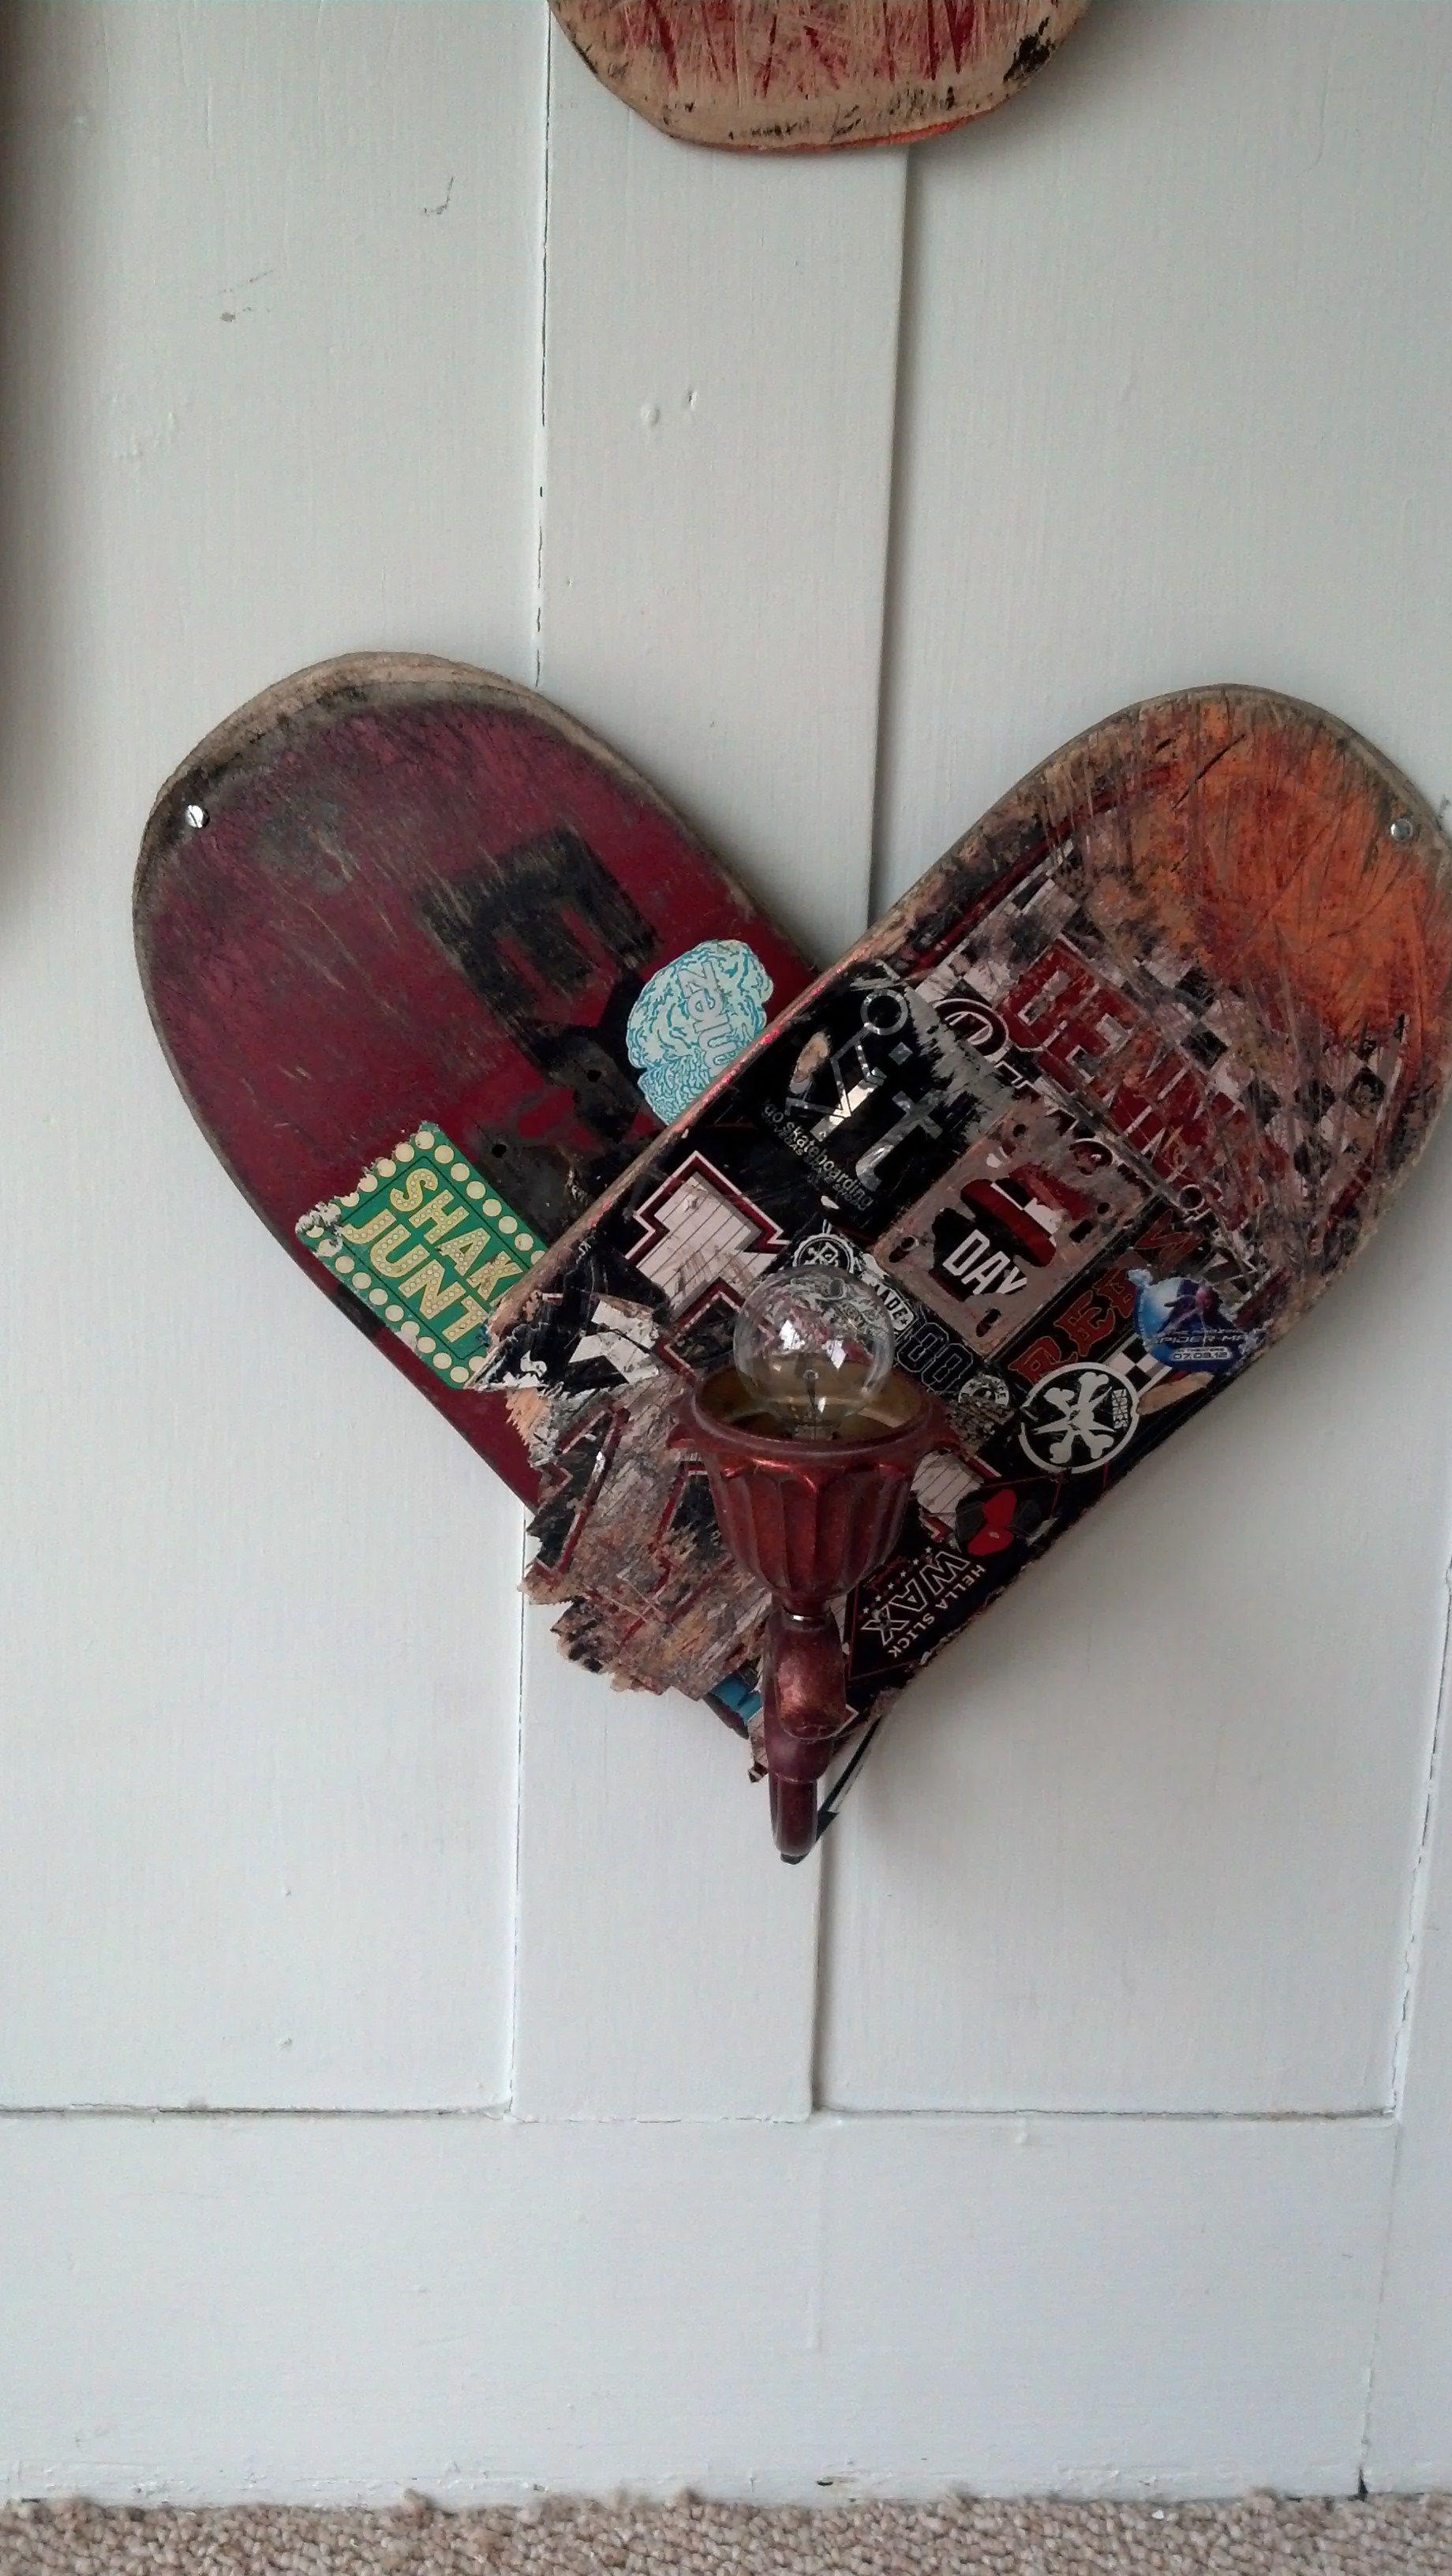 Skateboard Lamps heart skateboard art wall lamp $60 | art and creations for sale